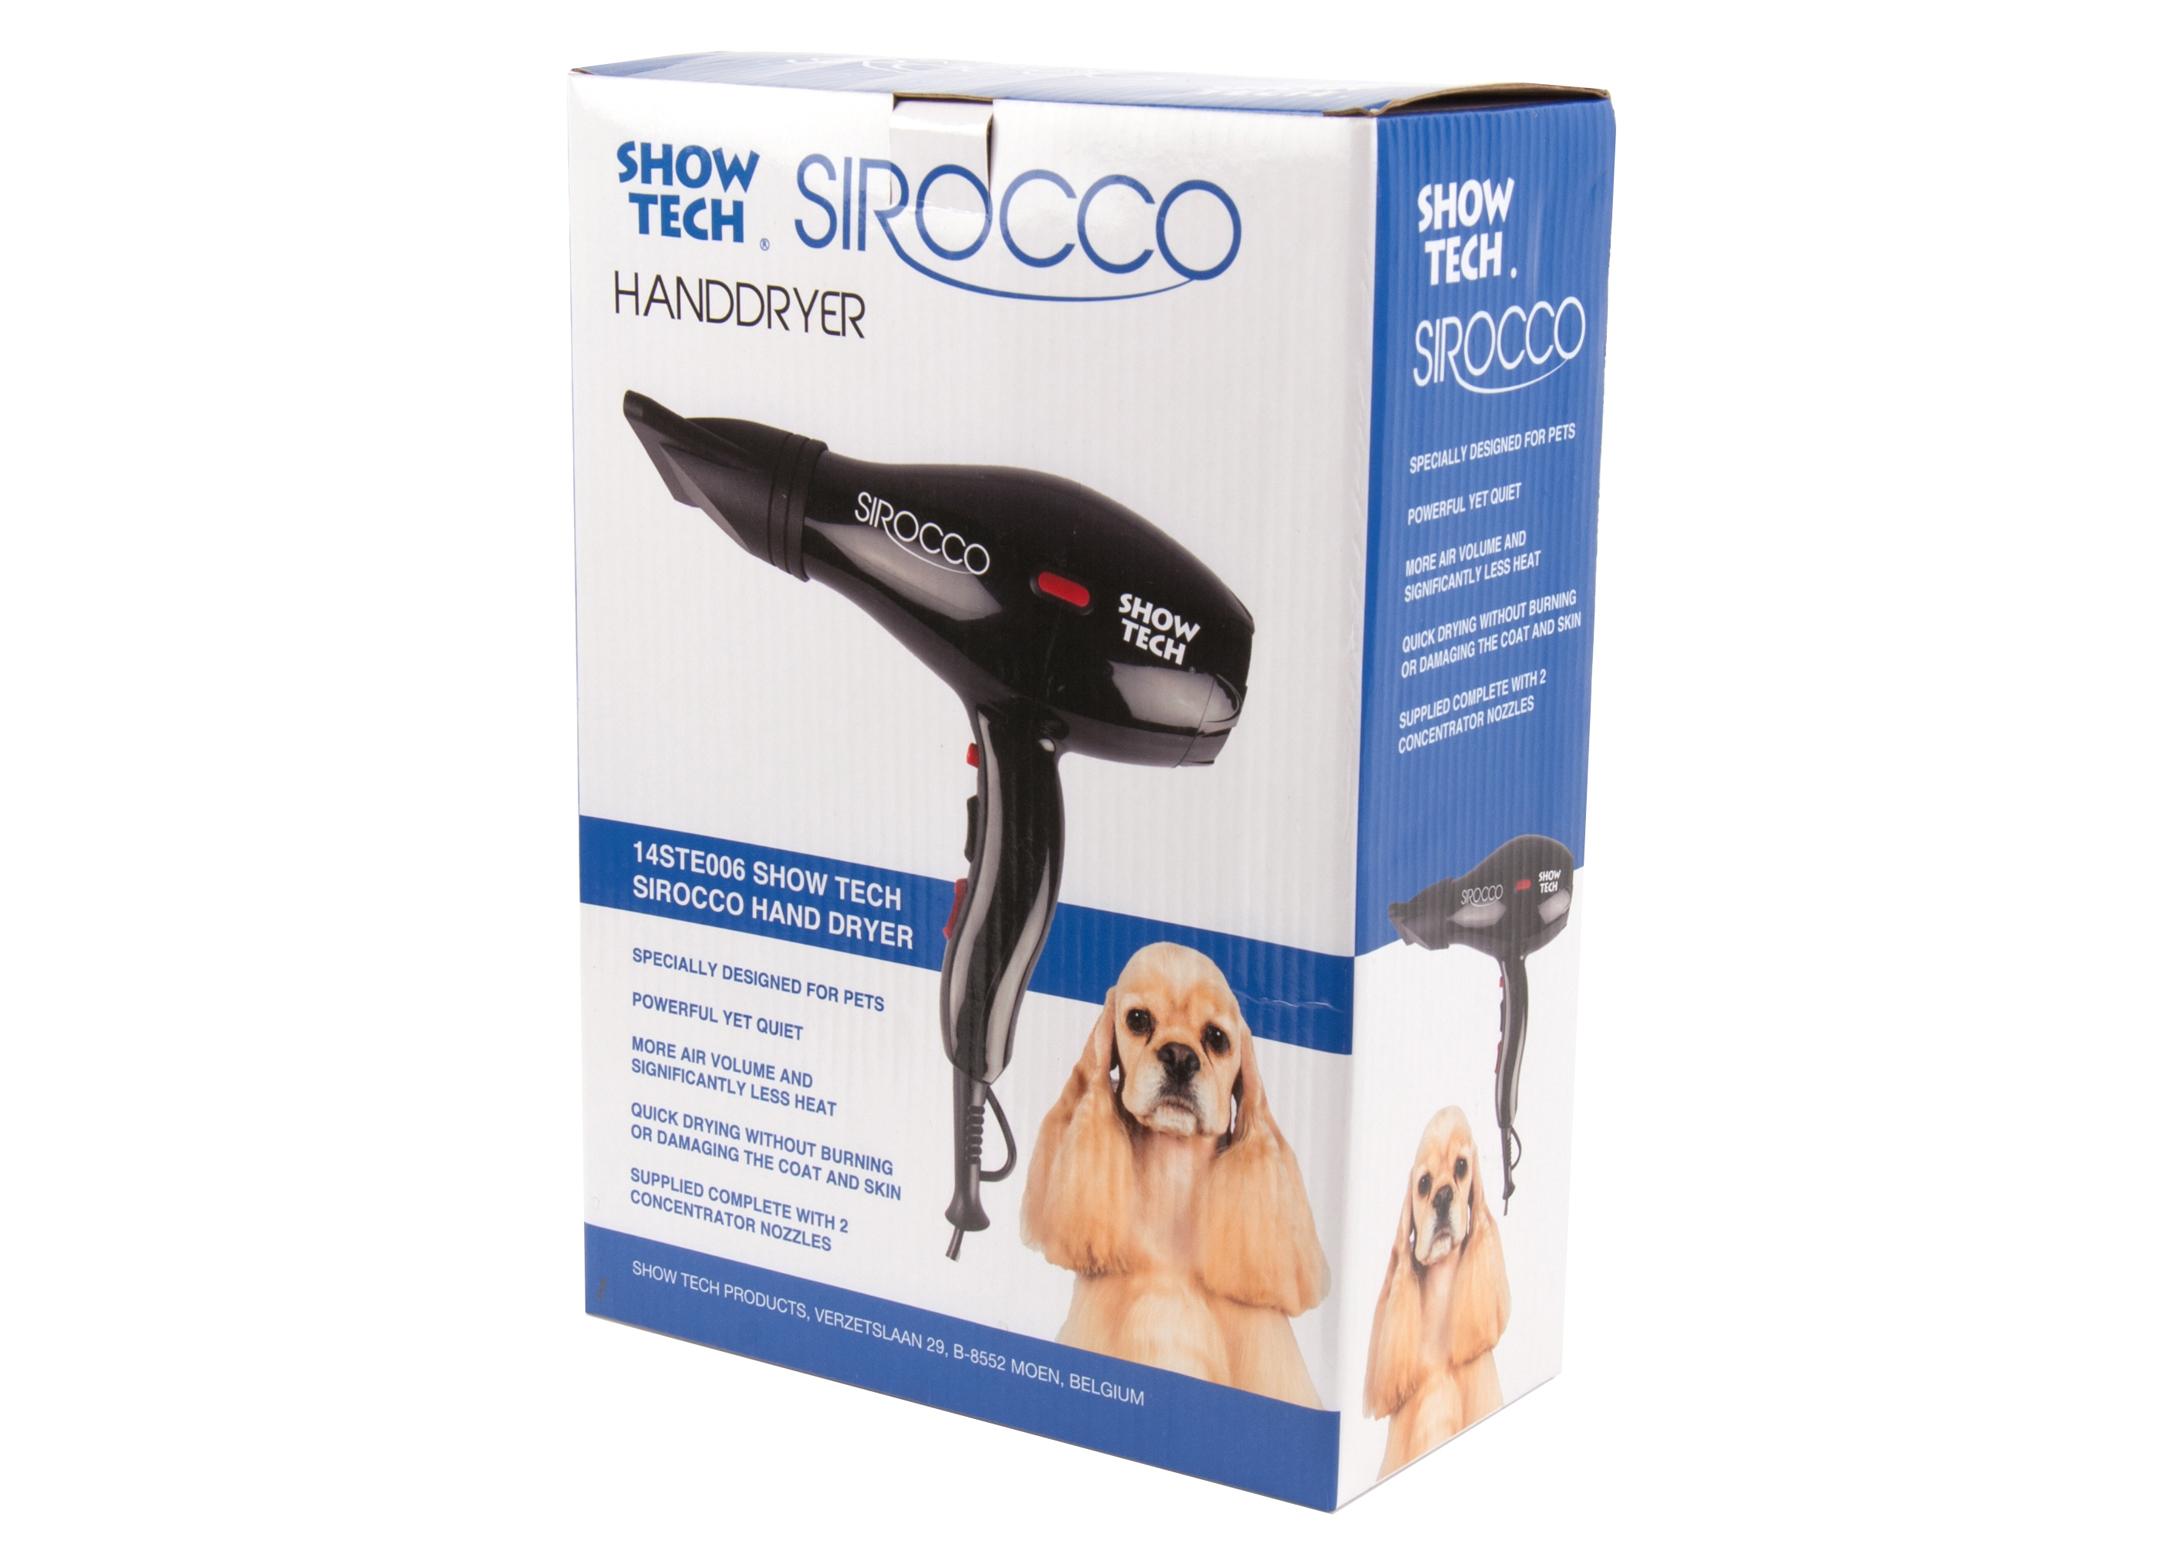 Show Tech Sirocco Hand Dryer Hair Dryer